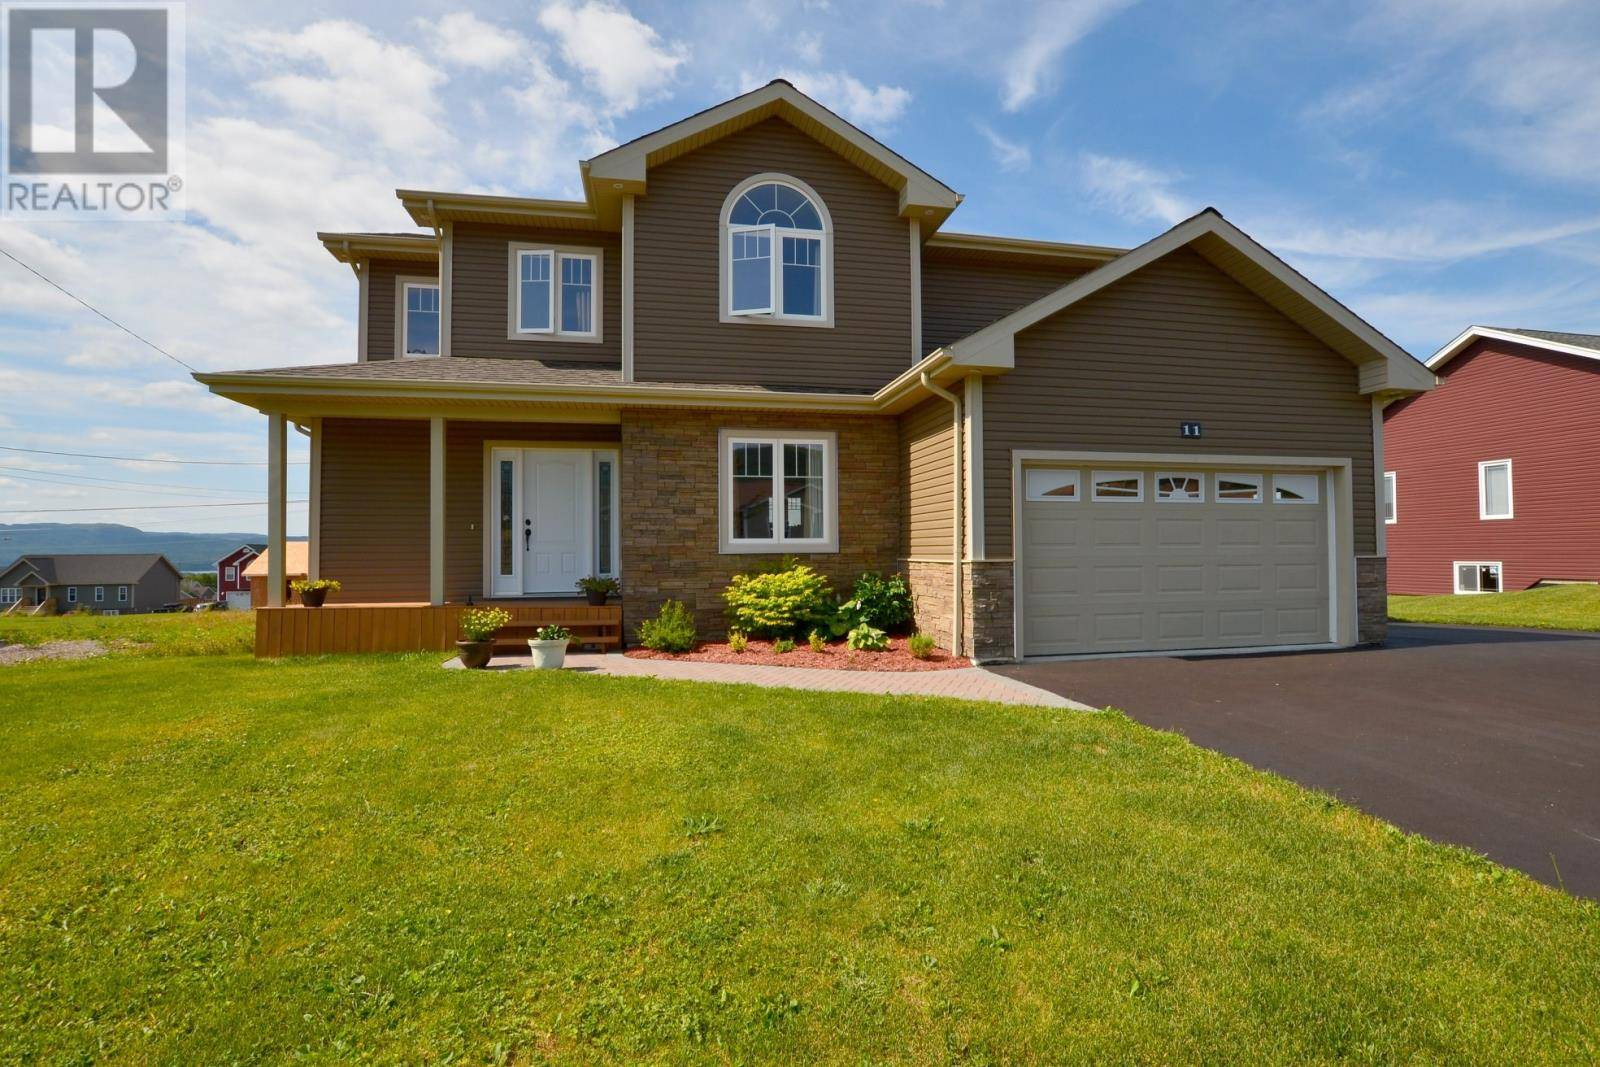 House for sale at 11 Penney Dr Pasadena Newfoundland - MLS: 1196740